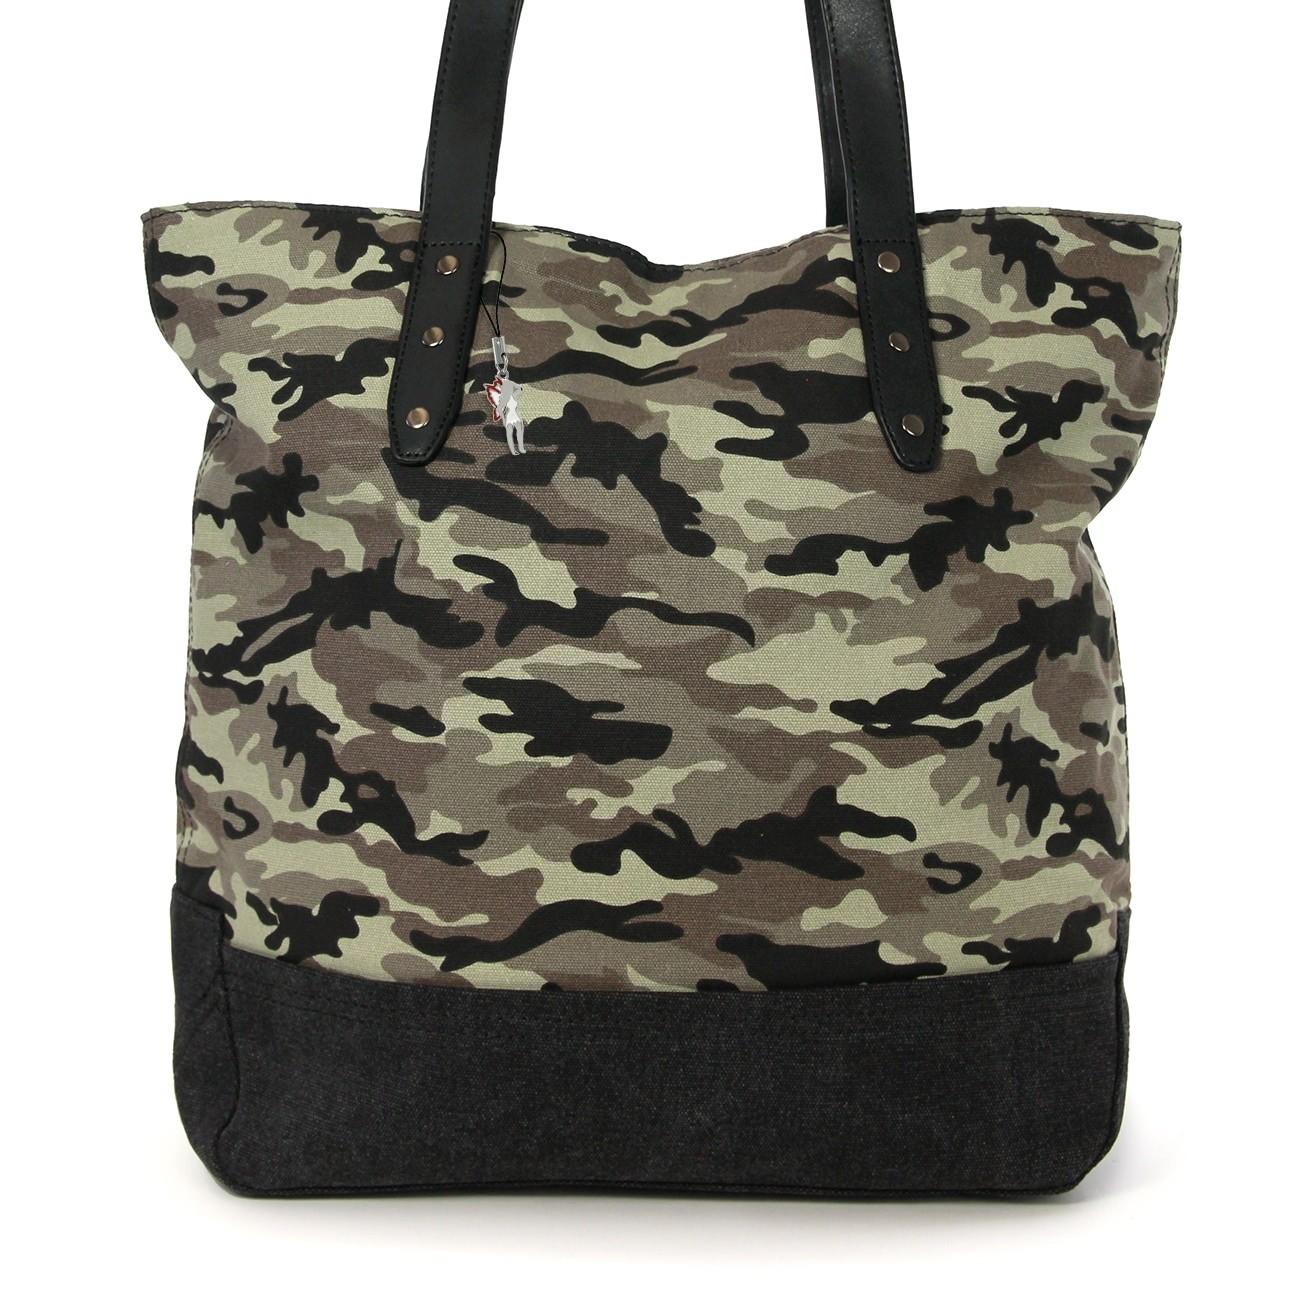 Beuteltasche Canvas armygrün Hobo Bag Schultertasche Bag Street OTJ219G